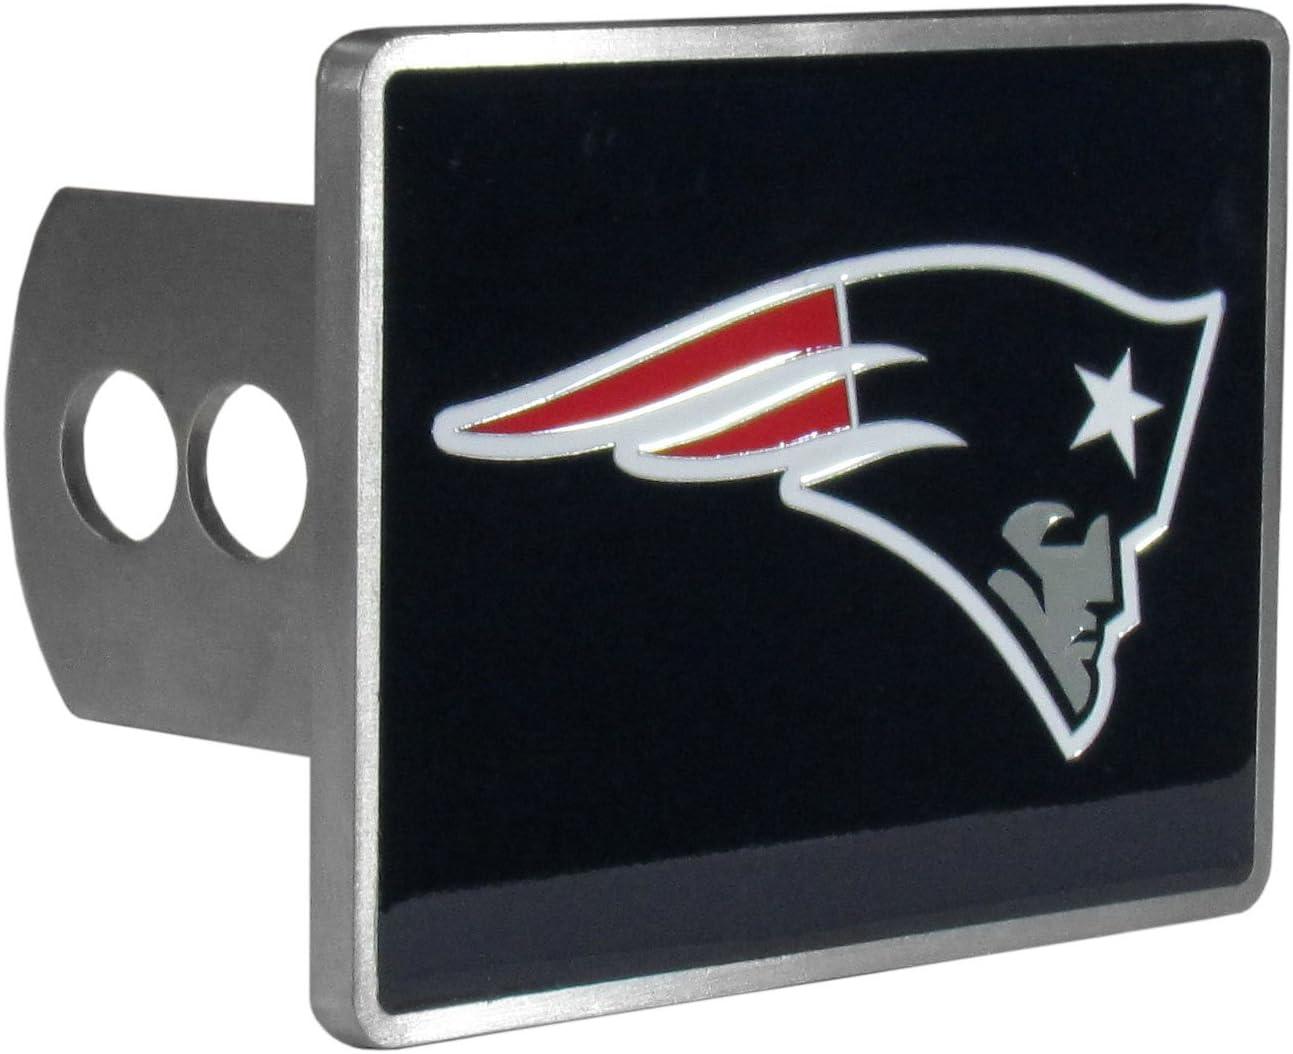 B0001KC0TI Siskiyou New England Patriots NFL Hitch Cover 71-fzC92BJYL